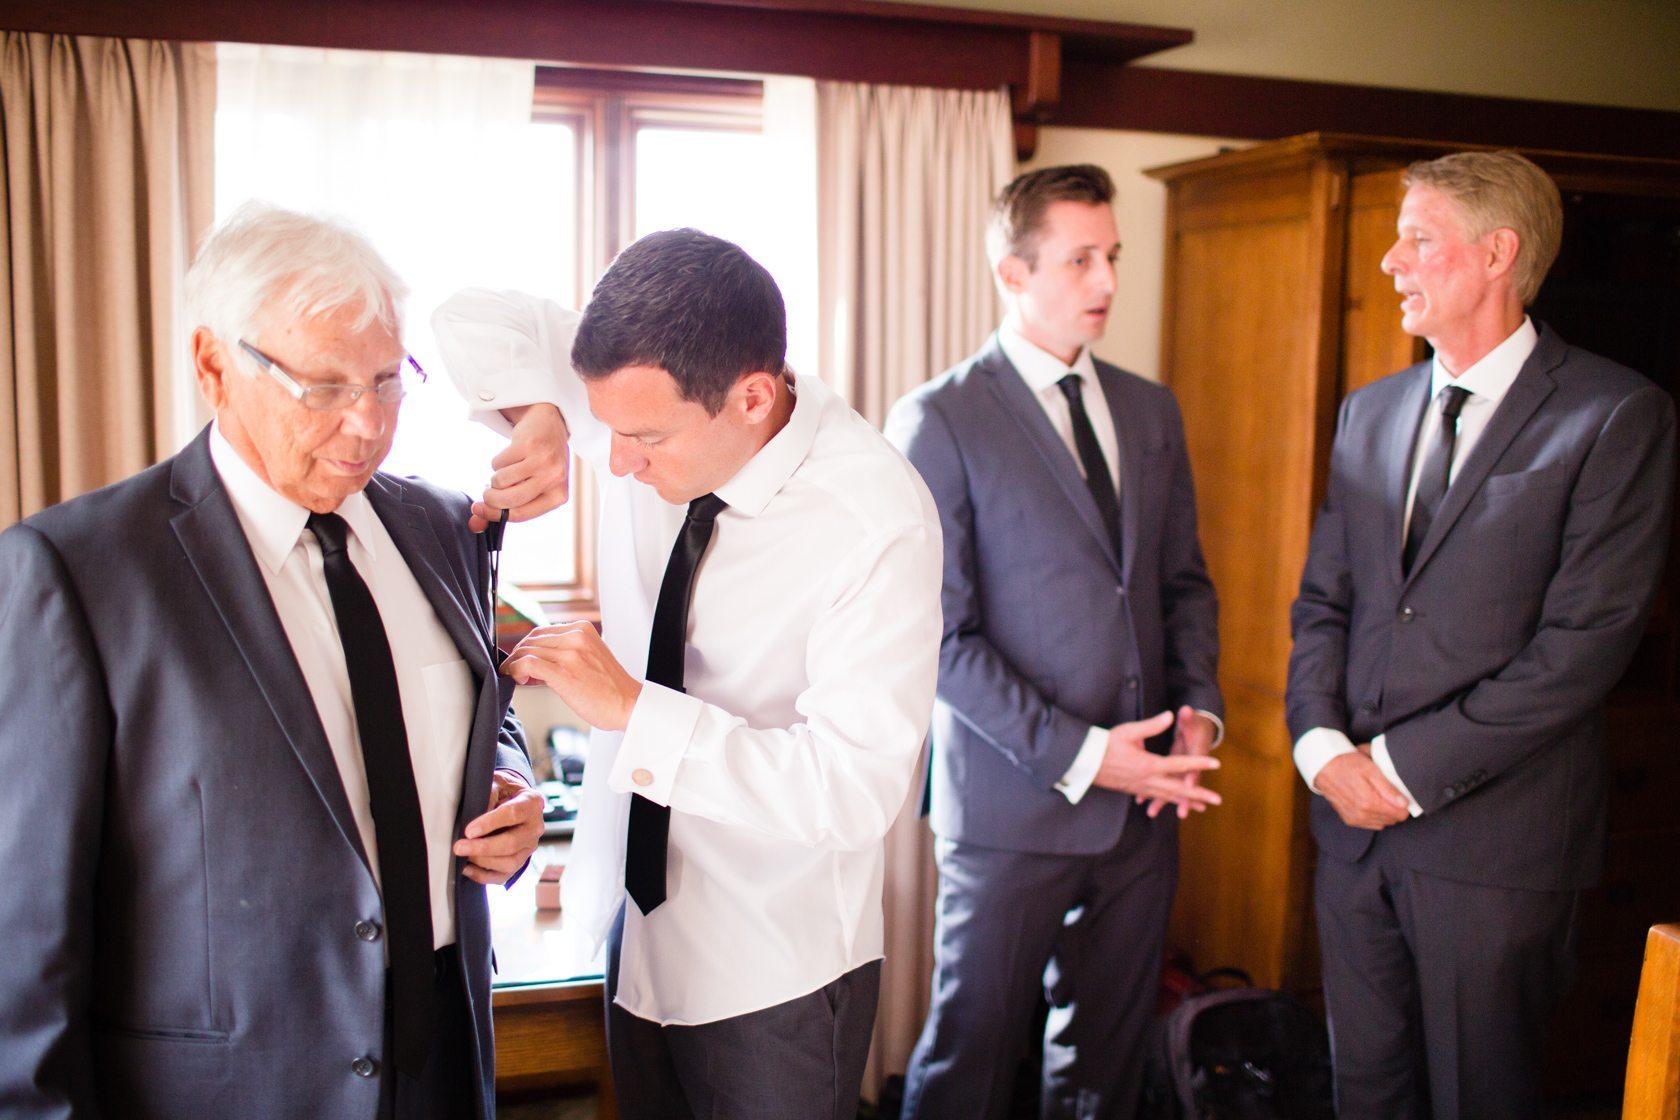 The_Lodge_at_Torrey_Pines_Wedding_026.jpg